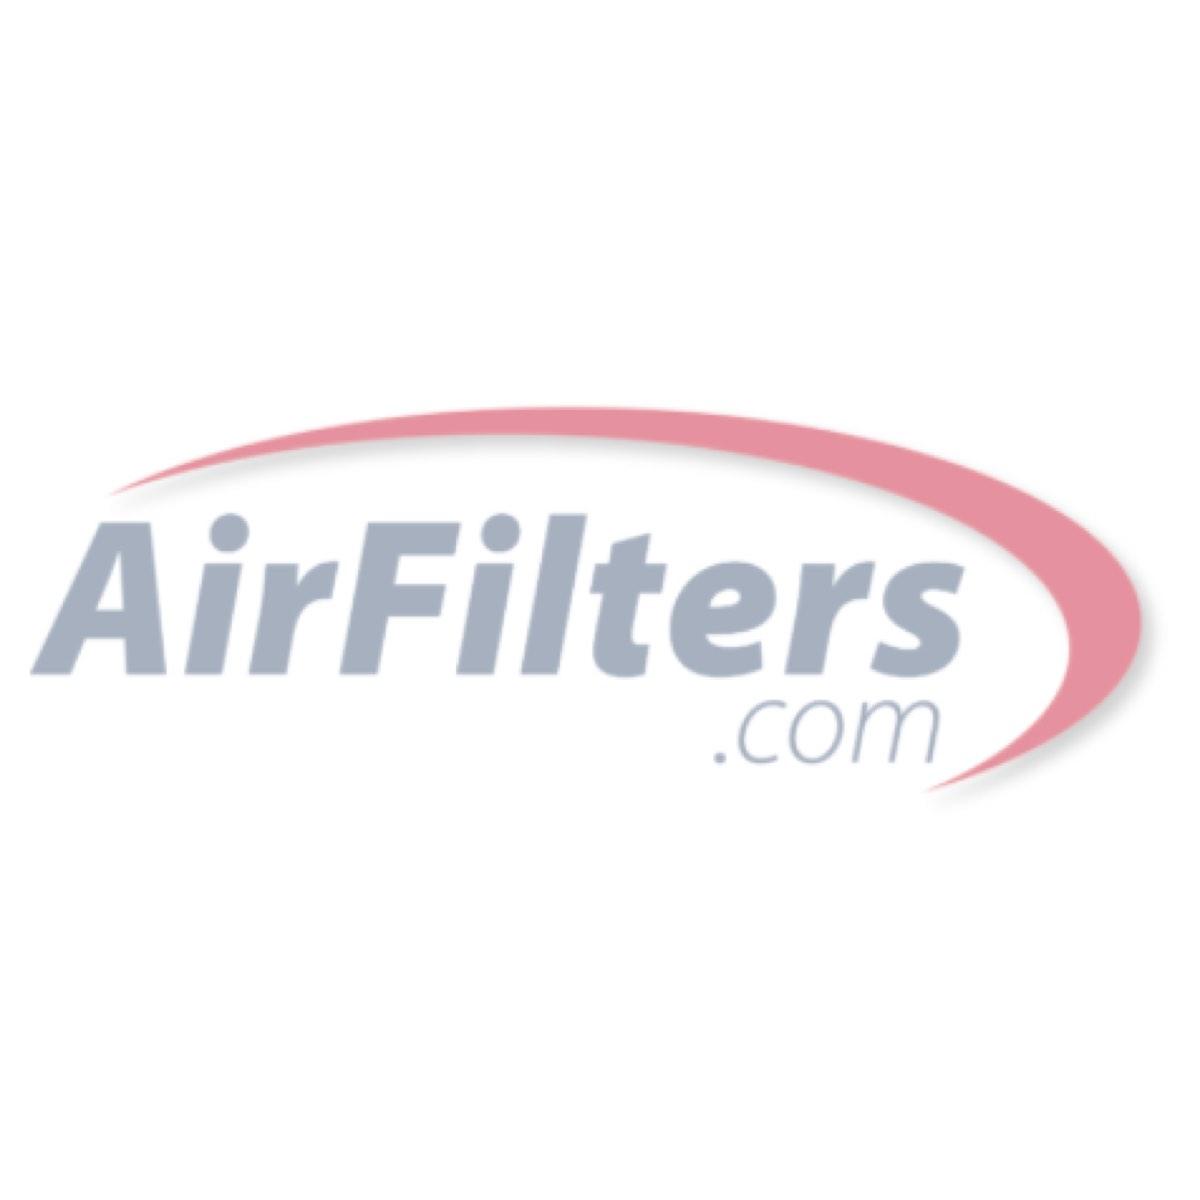 Accumulair Diamond MERV 13 Filters - 1 Inch